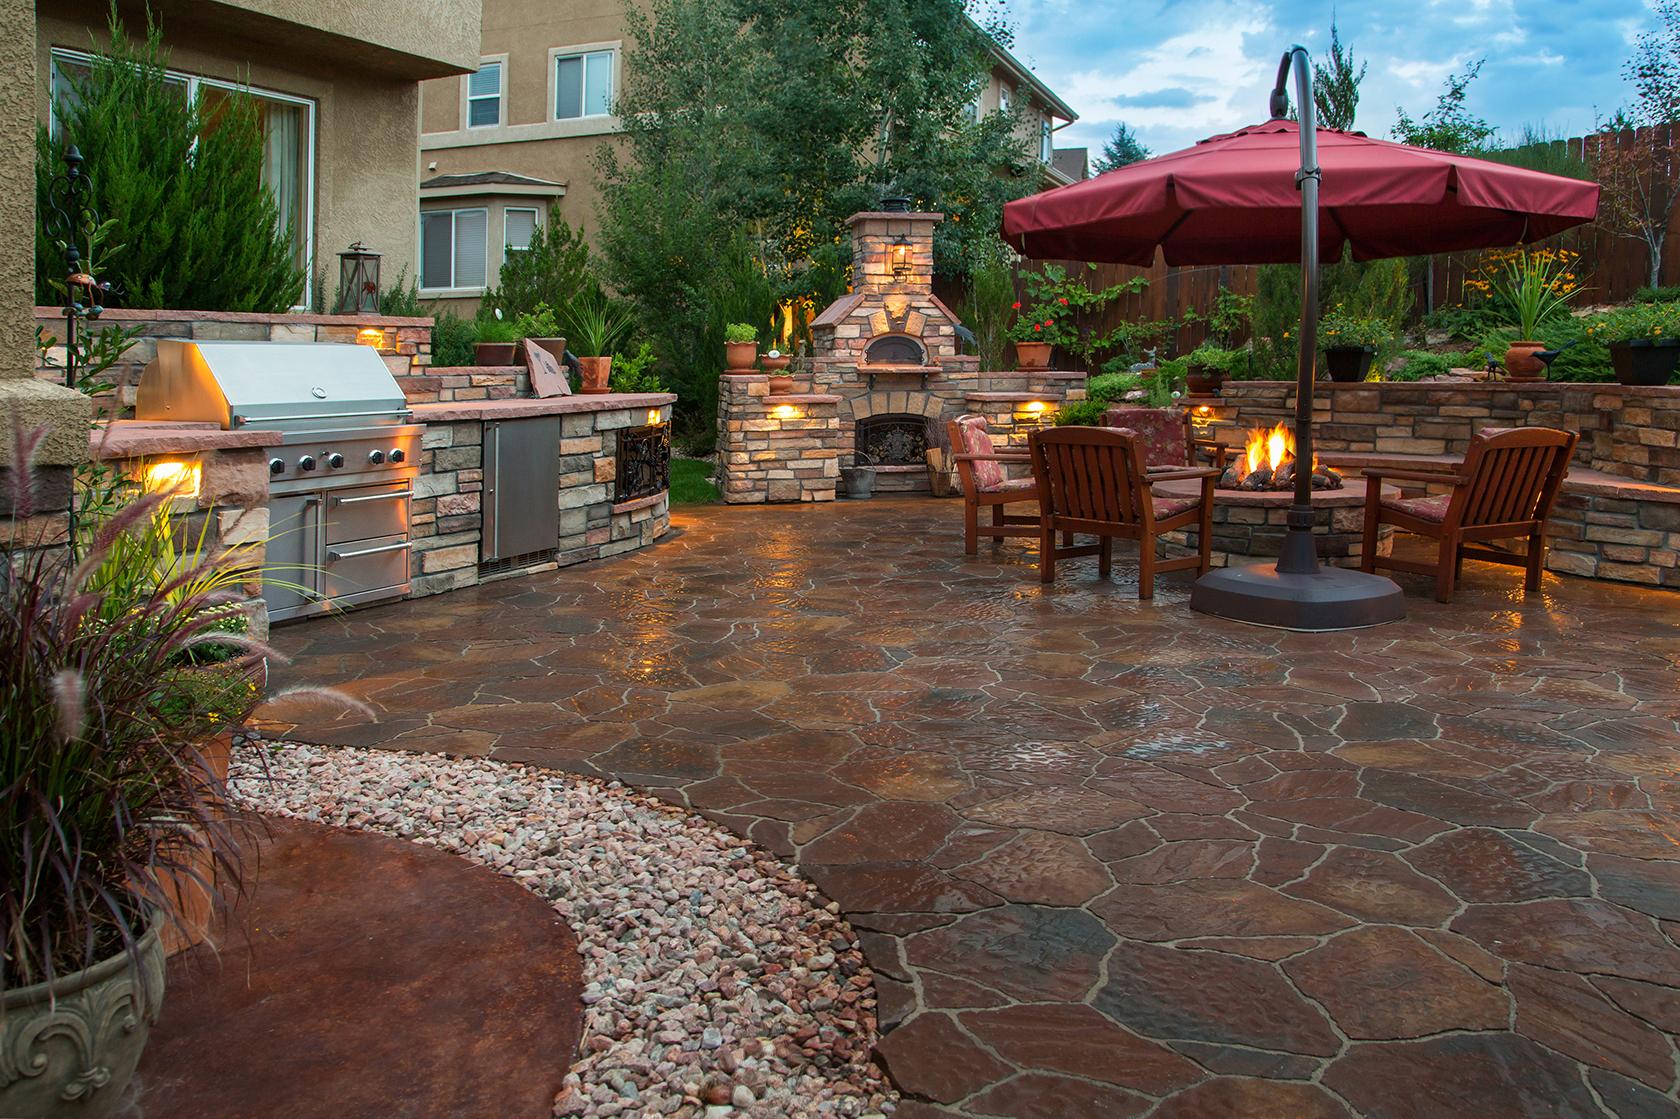 outdoor concrete patio.jpg